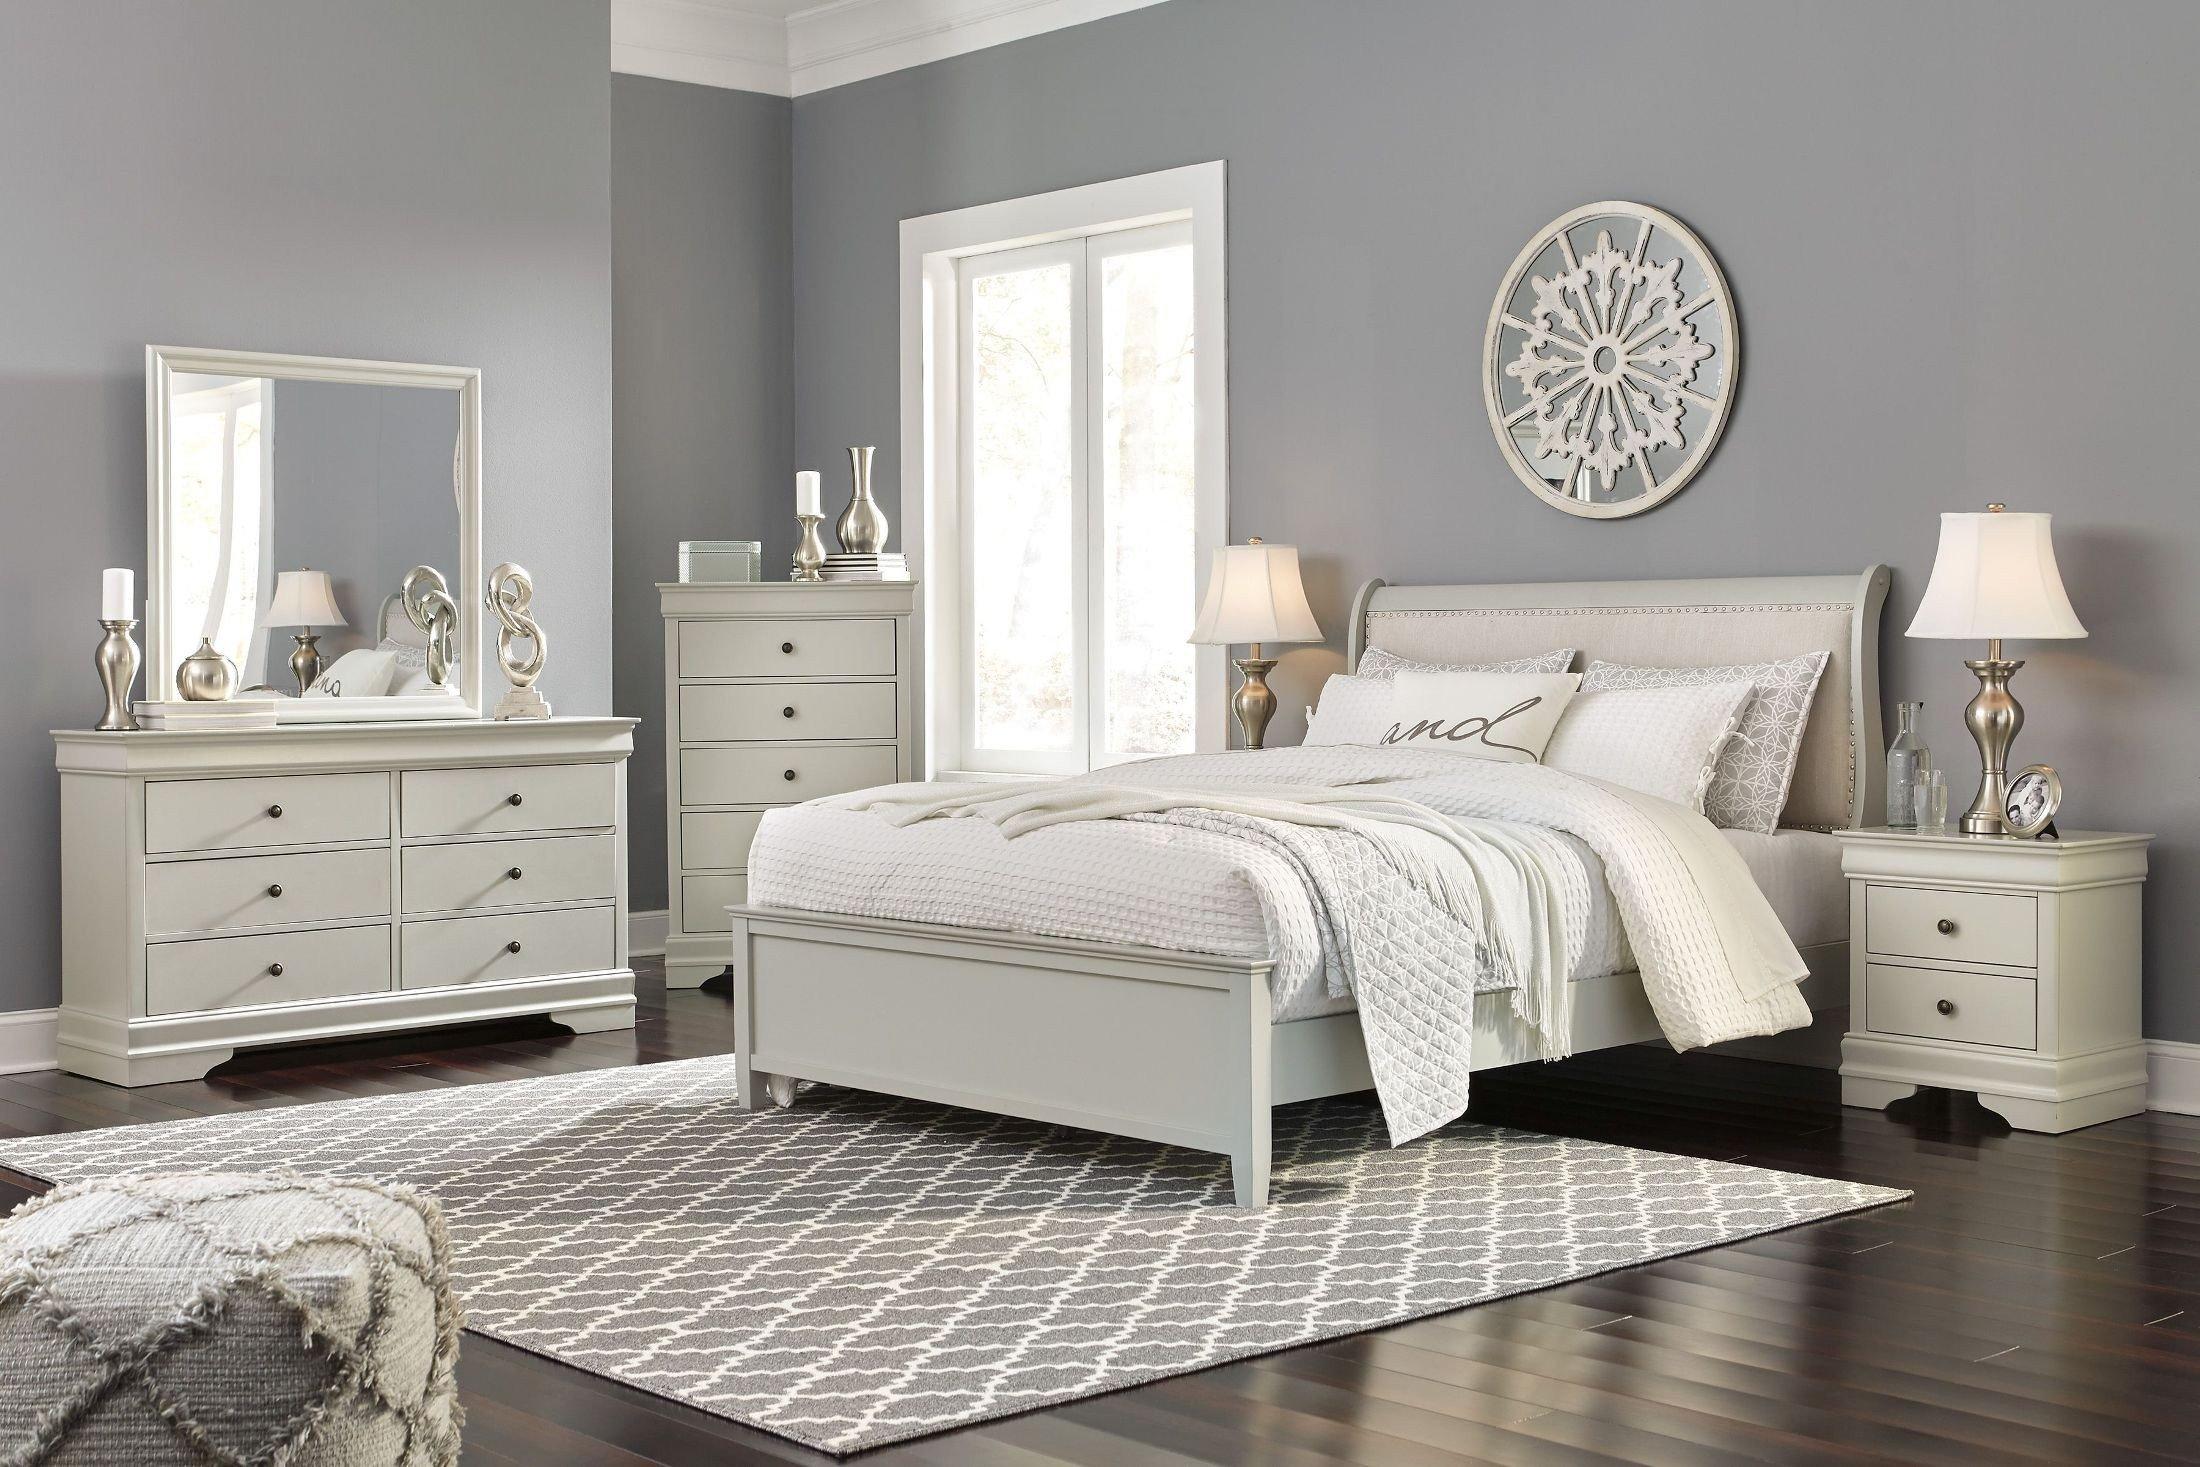 Bedroom Set ashley Furniture Best Of Jorstad Gray King Upholstered Sleigh Bed